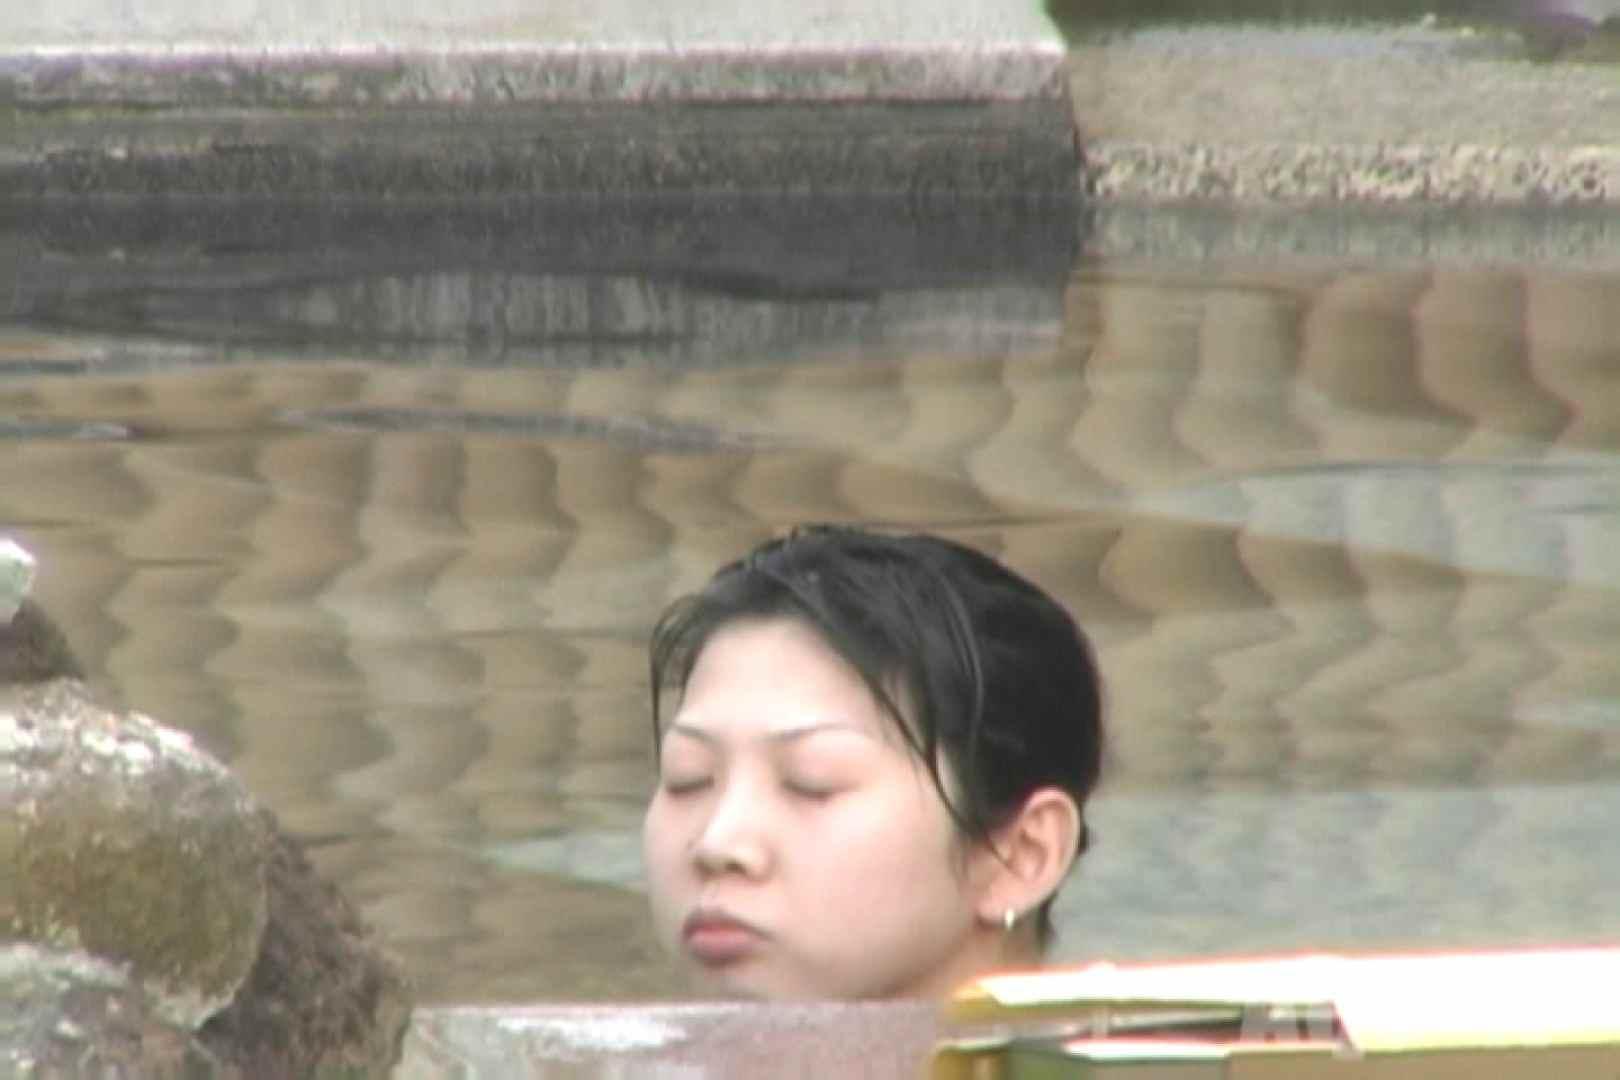 Aquaな露天風呂Vol.850 露天 | HなOL  79pic 63